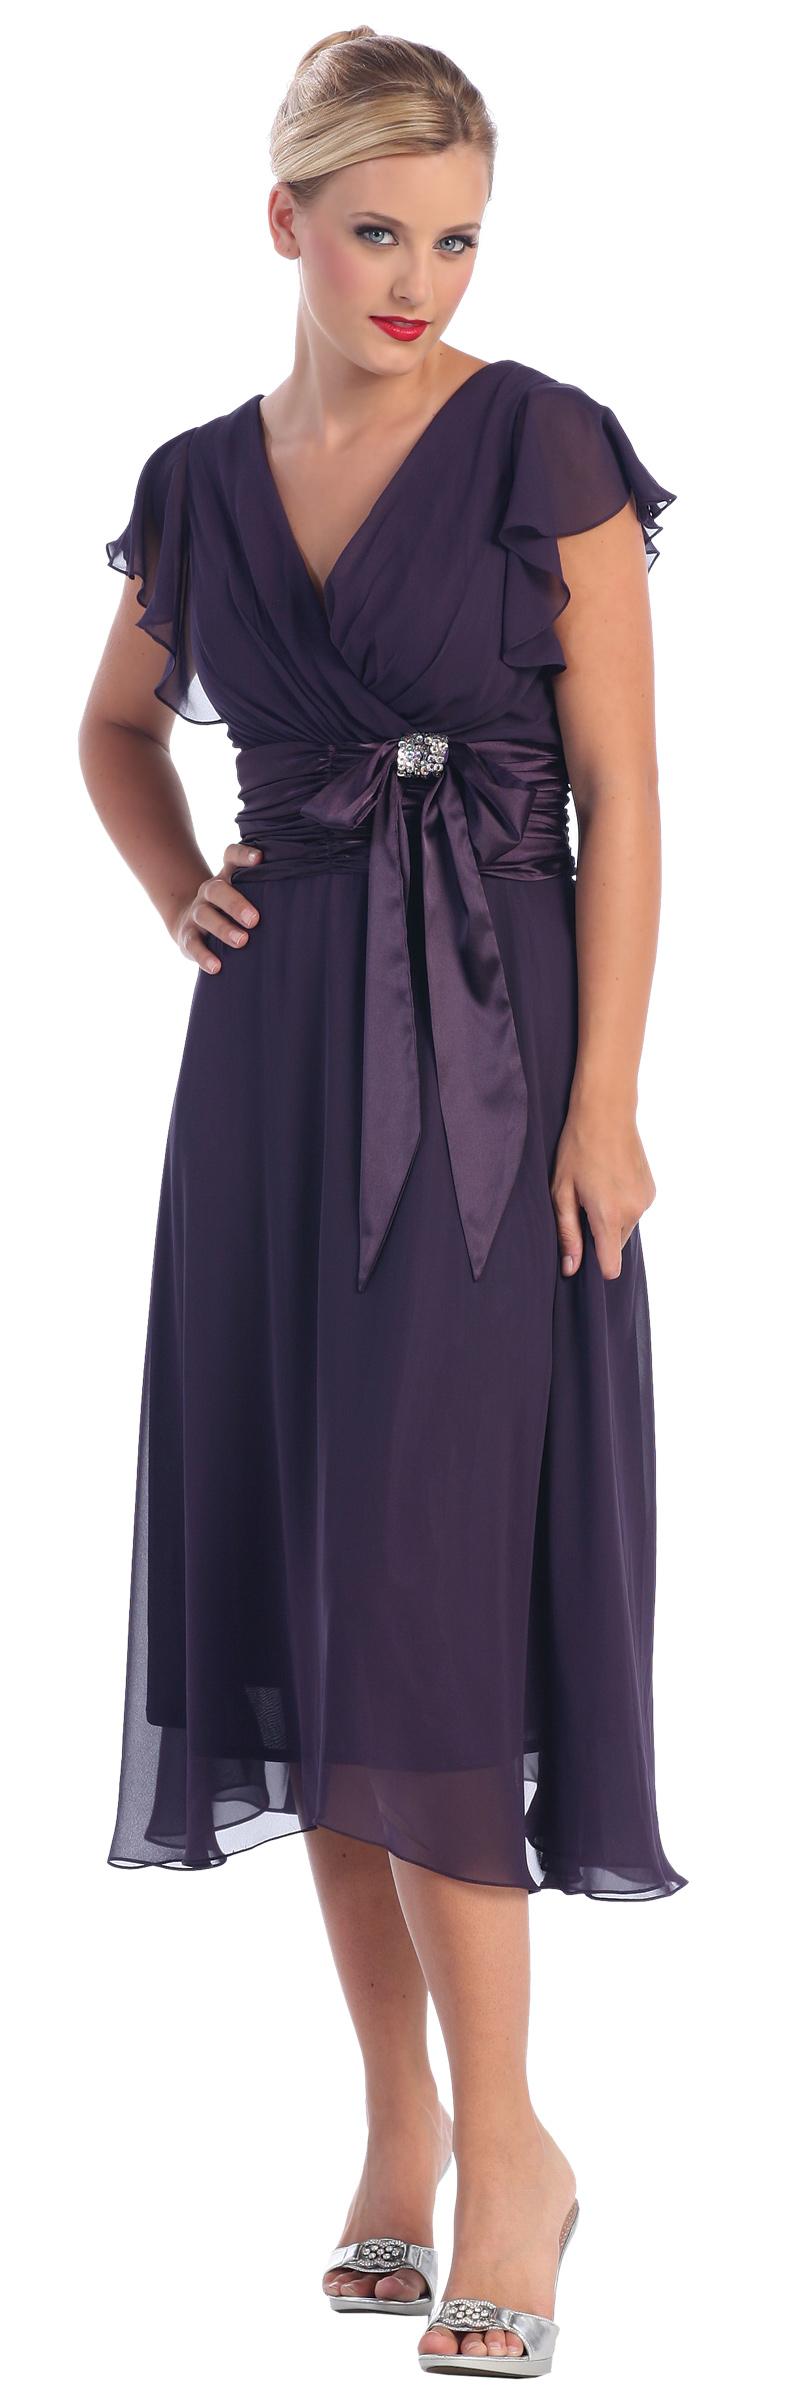 Elegant Mother of the Bride Dress in Plum